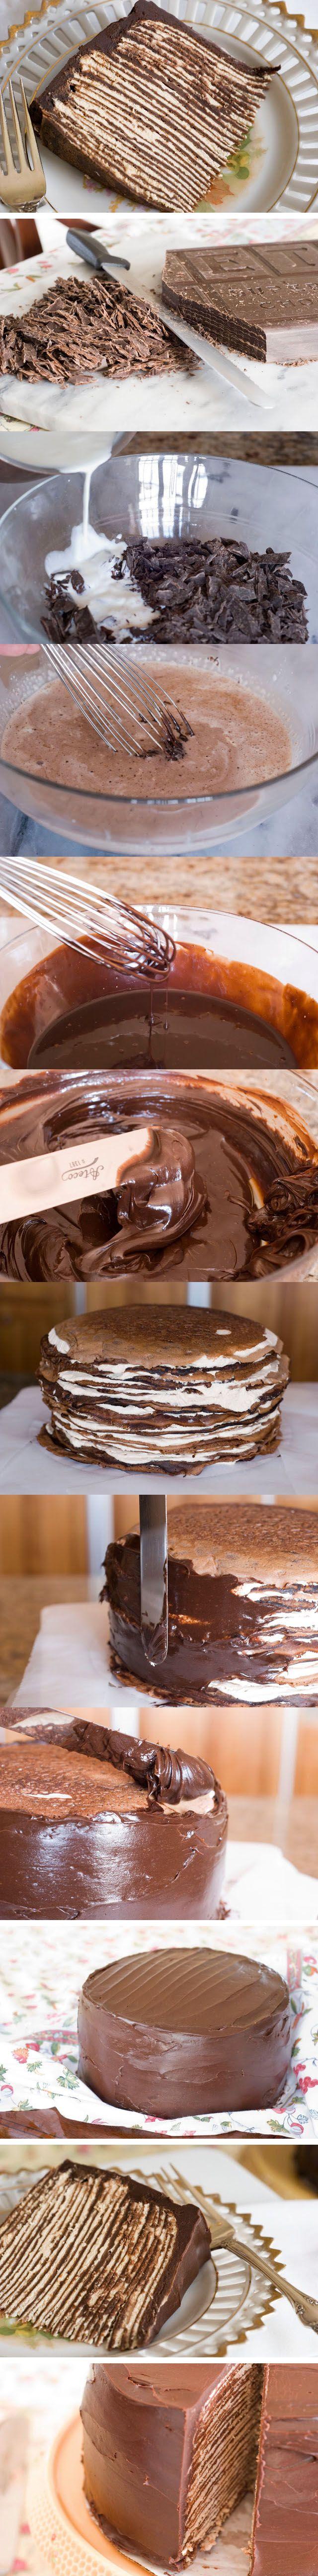 Tarta de crepes con chocolate | Pecados de Reposteria